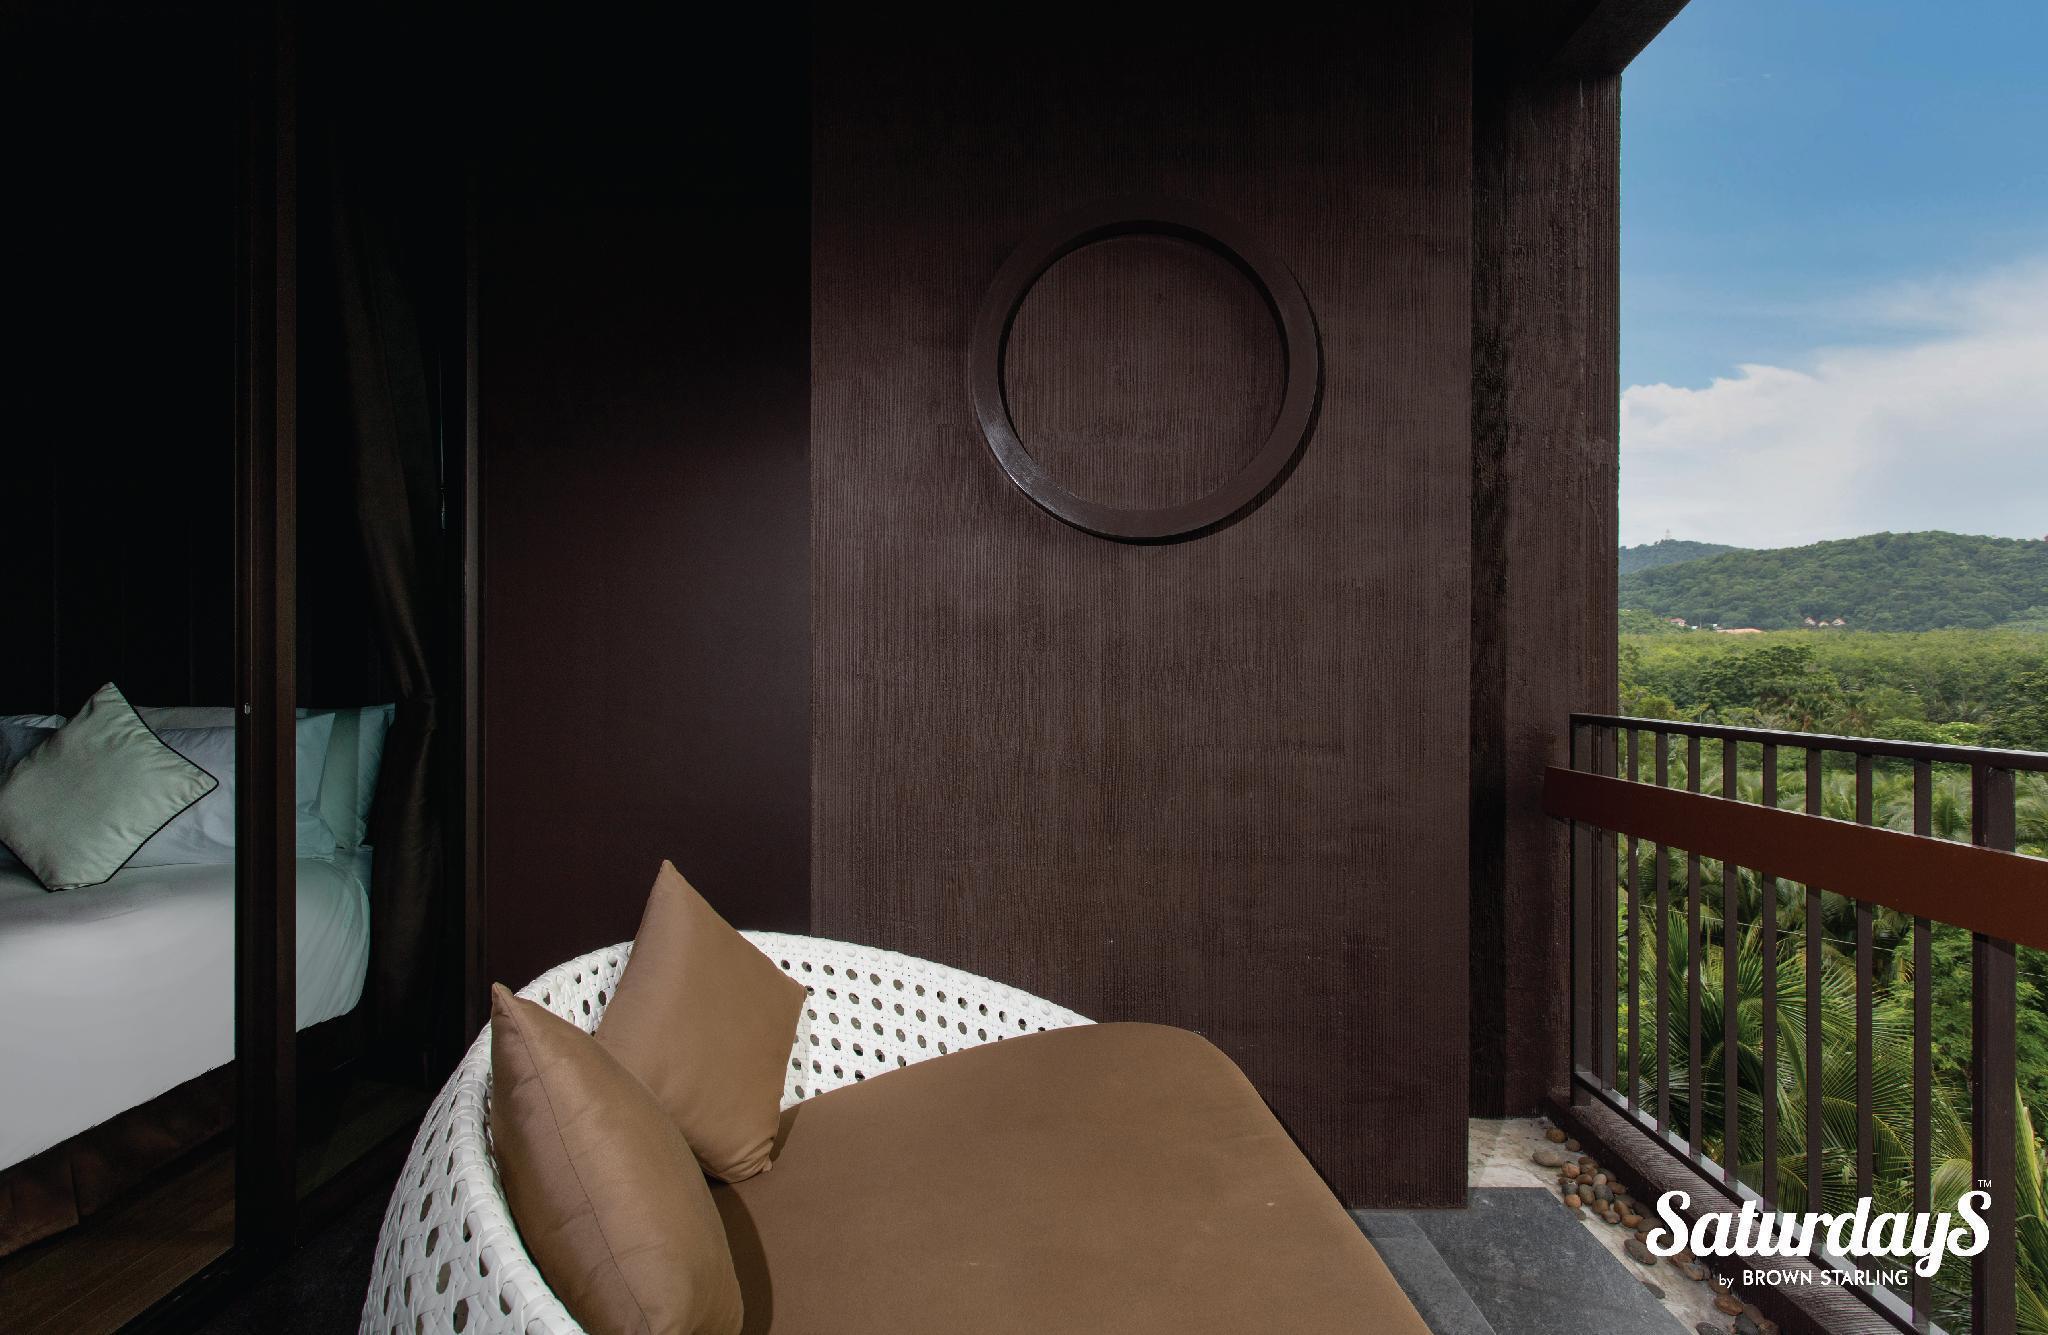 SW1 - Saturdays Residence 1BR Suite with balcony อพาร์ตเมนต์ 1 ห้องนอน 1 ห้องน้ำส่วนตัว ขนาด 56 ตร.ม. – หาดราไวย์